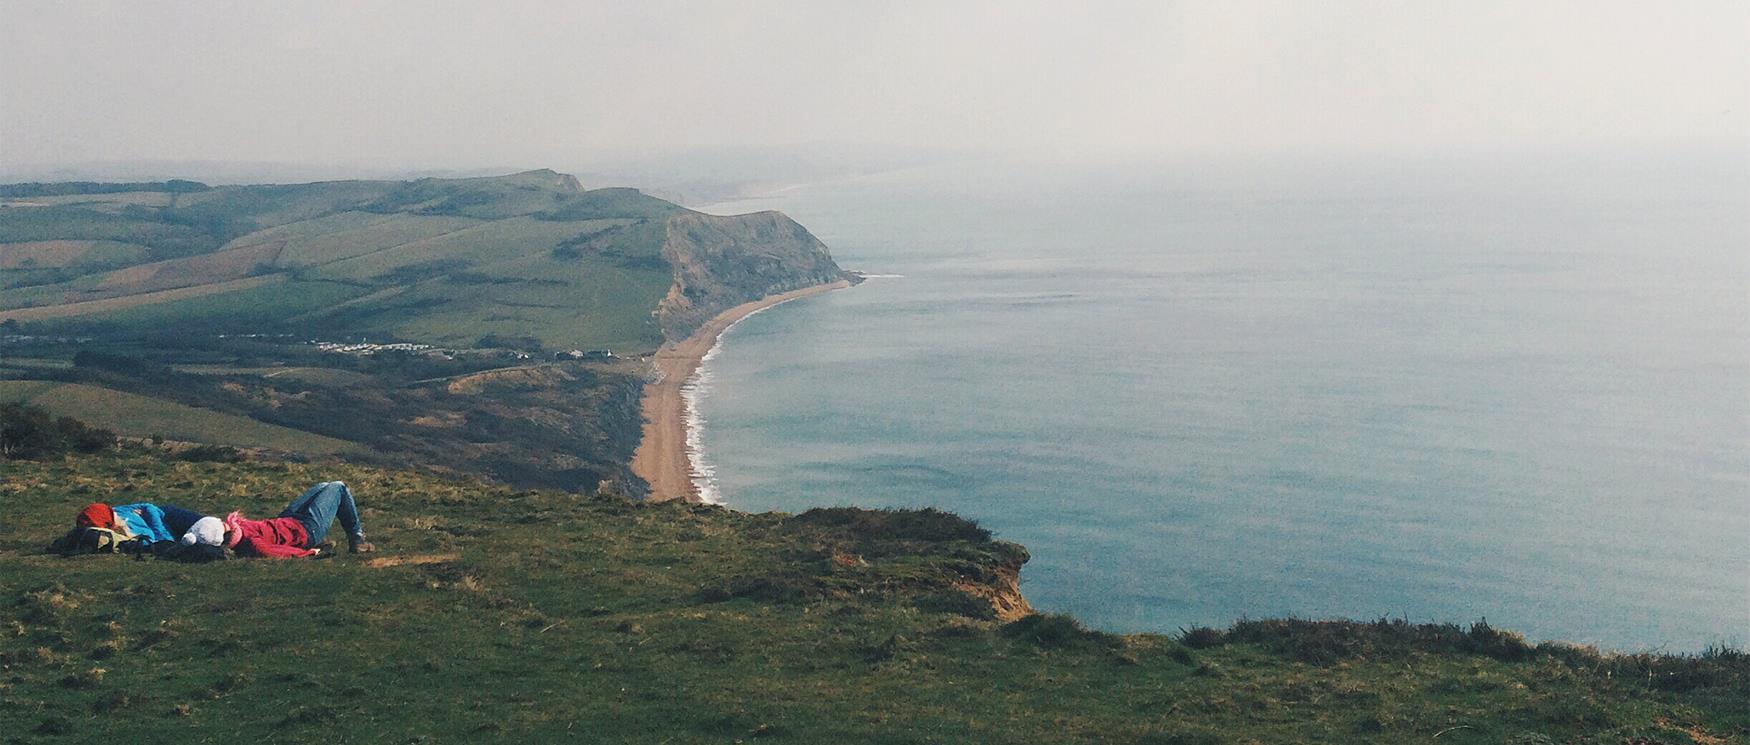 The Jurassic Coast, Dorset